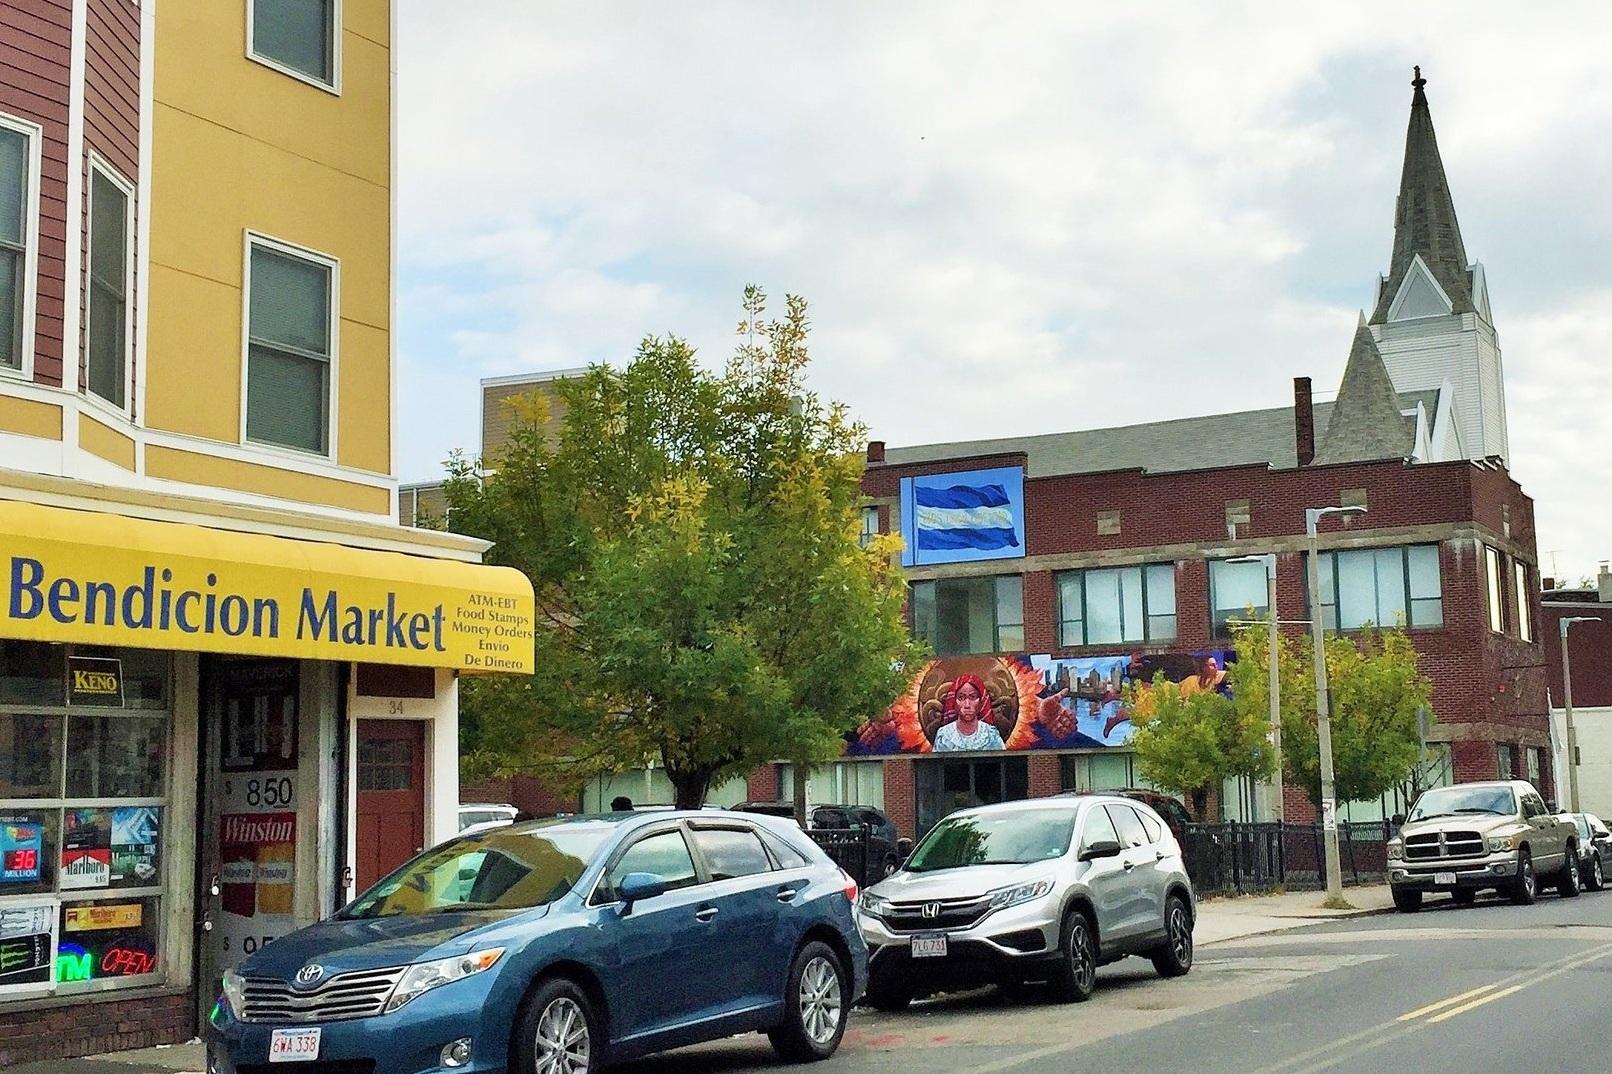 Hispanics in the Neighborhood - Sharon Granados Mahato